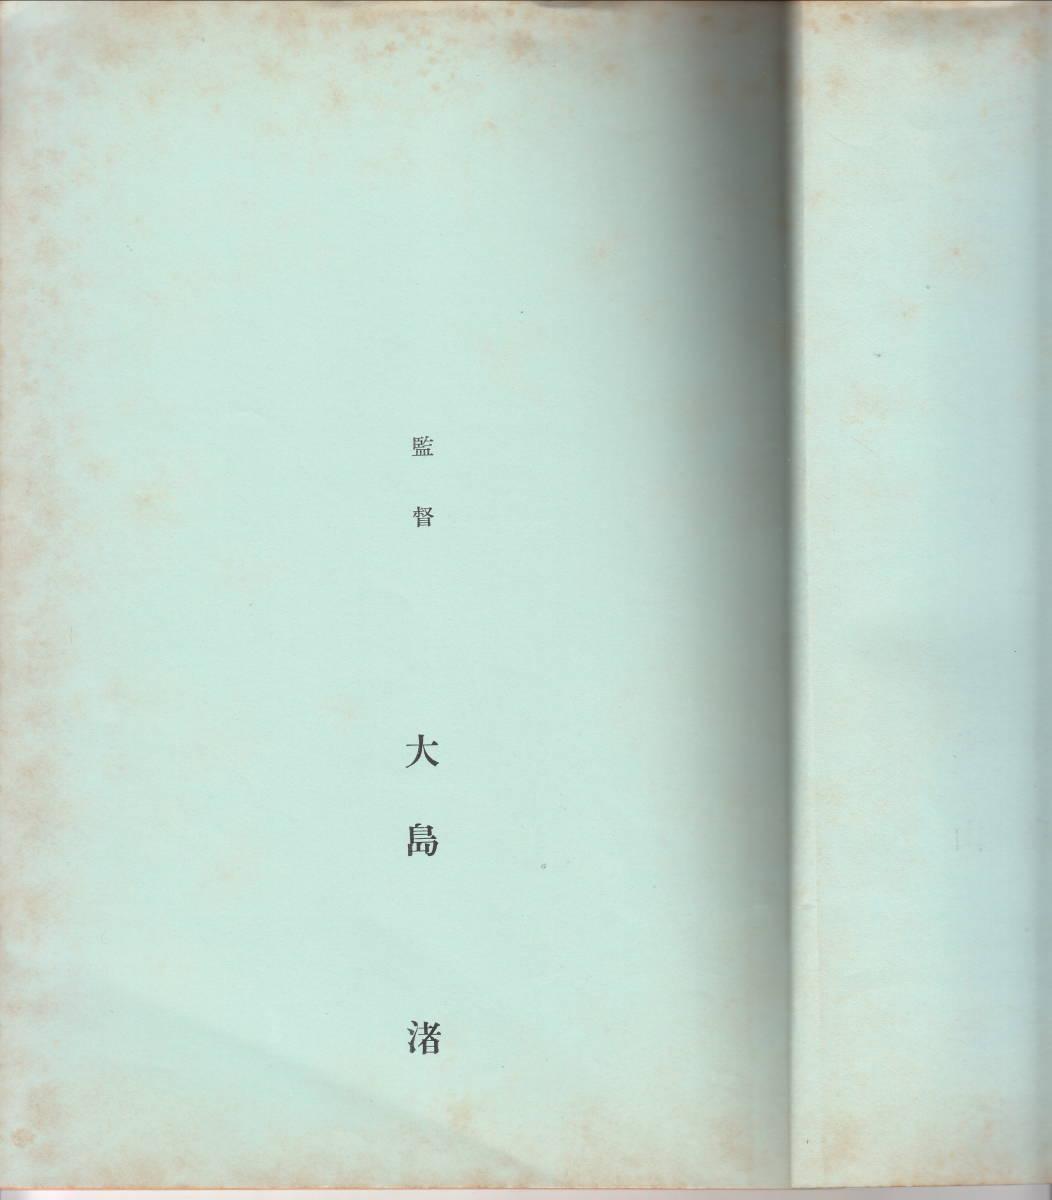 台本「小さな冒険旅行」(大島渚)_画像3